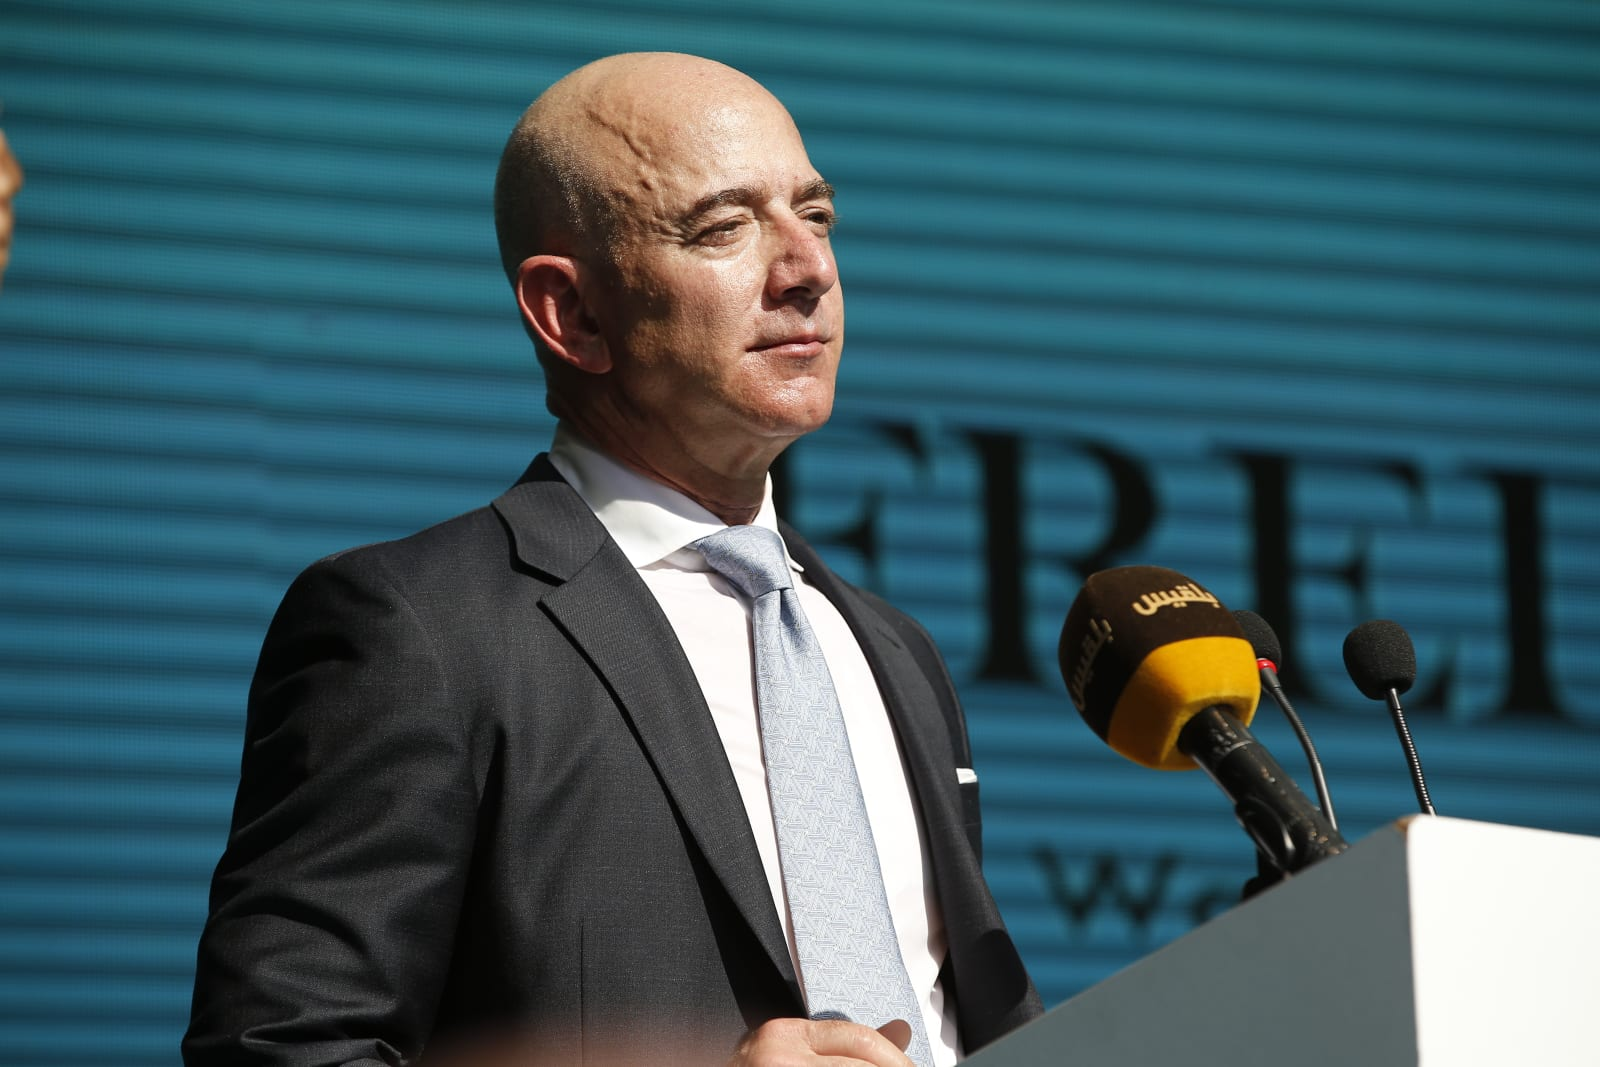 UN calls for investigation into alleged Saudi hacking of Jeff Bezos